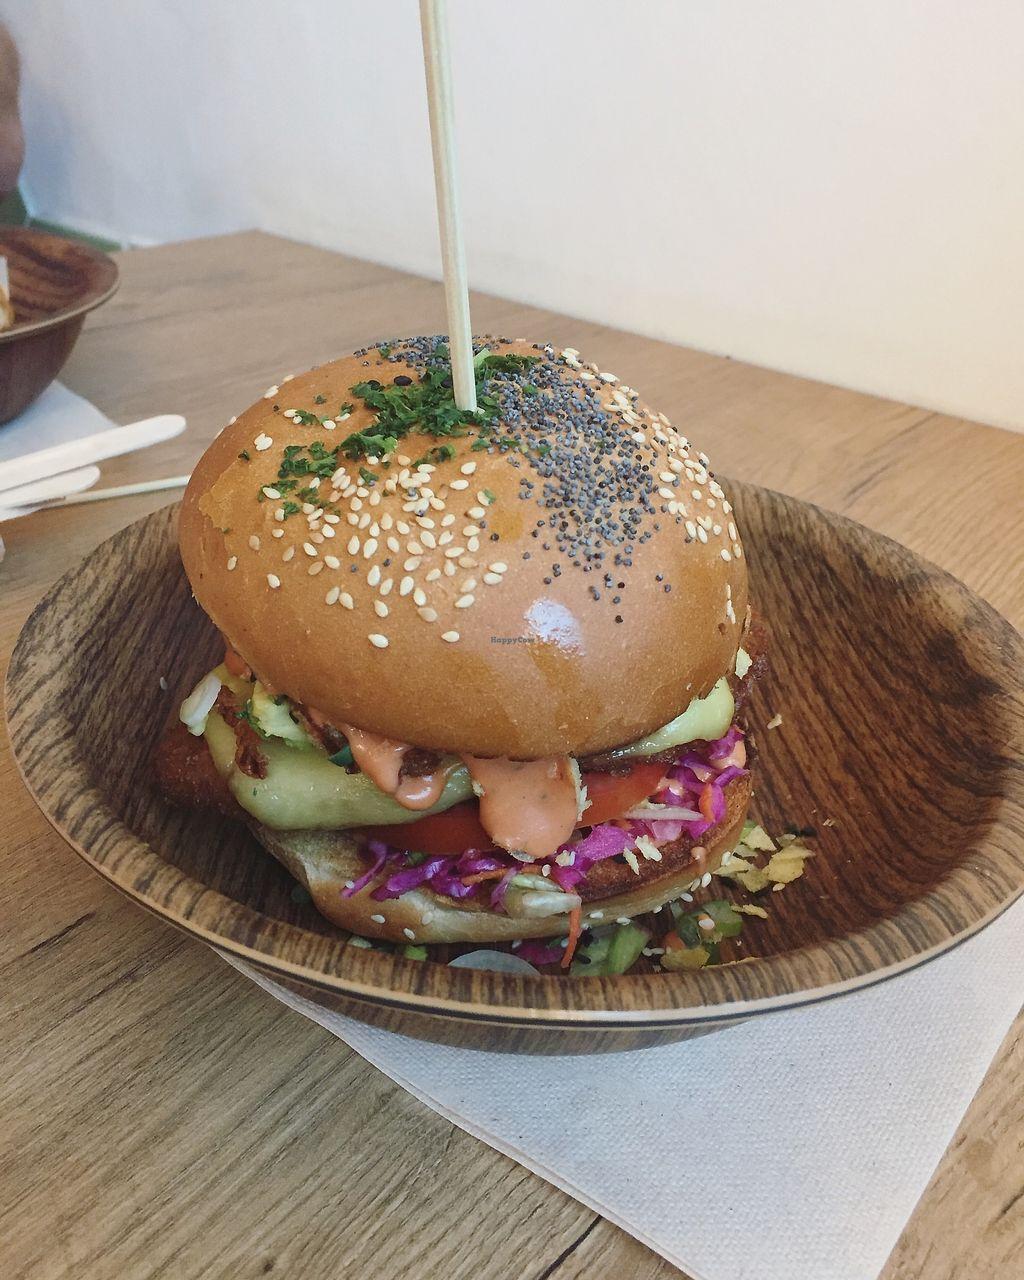 "Photo of Lekker Vegan  by <a href=""/members/profile/paullikespasta"">paullikespasta</a> <br/>Spicy Vegan burger <br/> February 21, 2018  - <a href='/contact/abuse/image/104251/361966'>Report</a>"